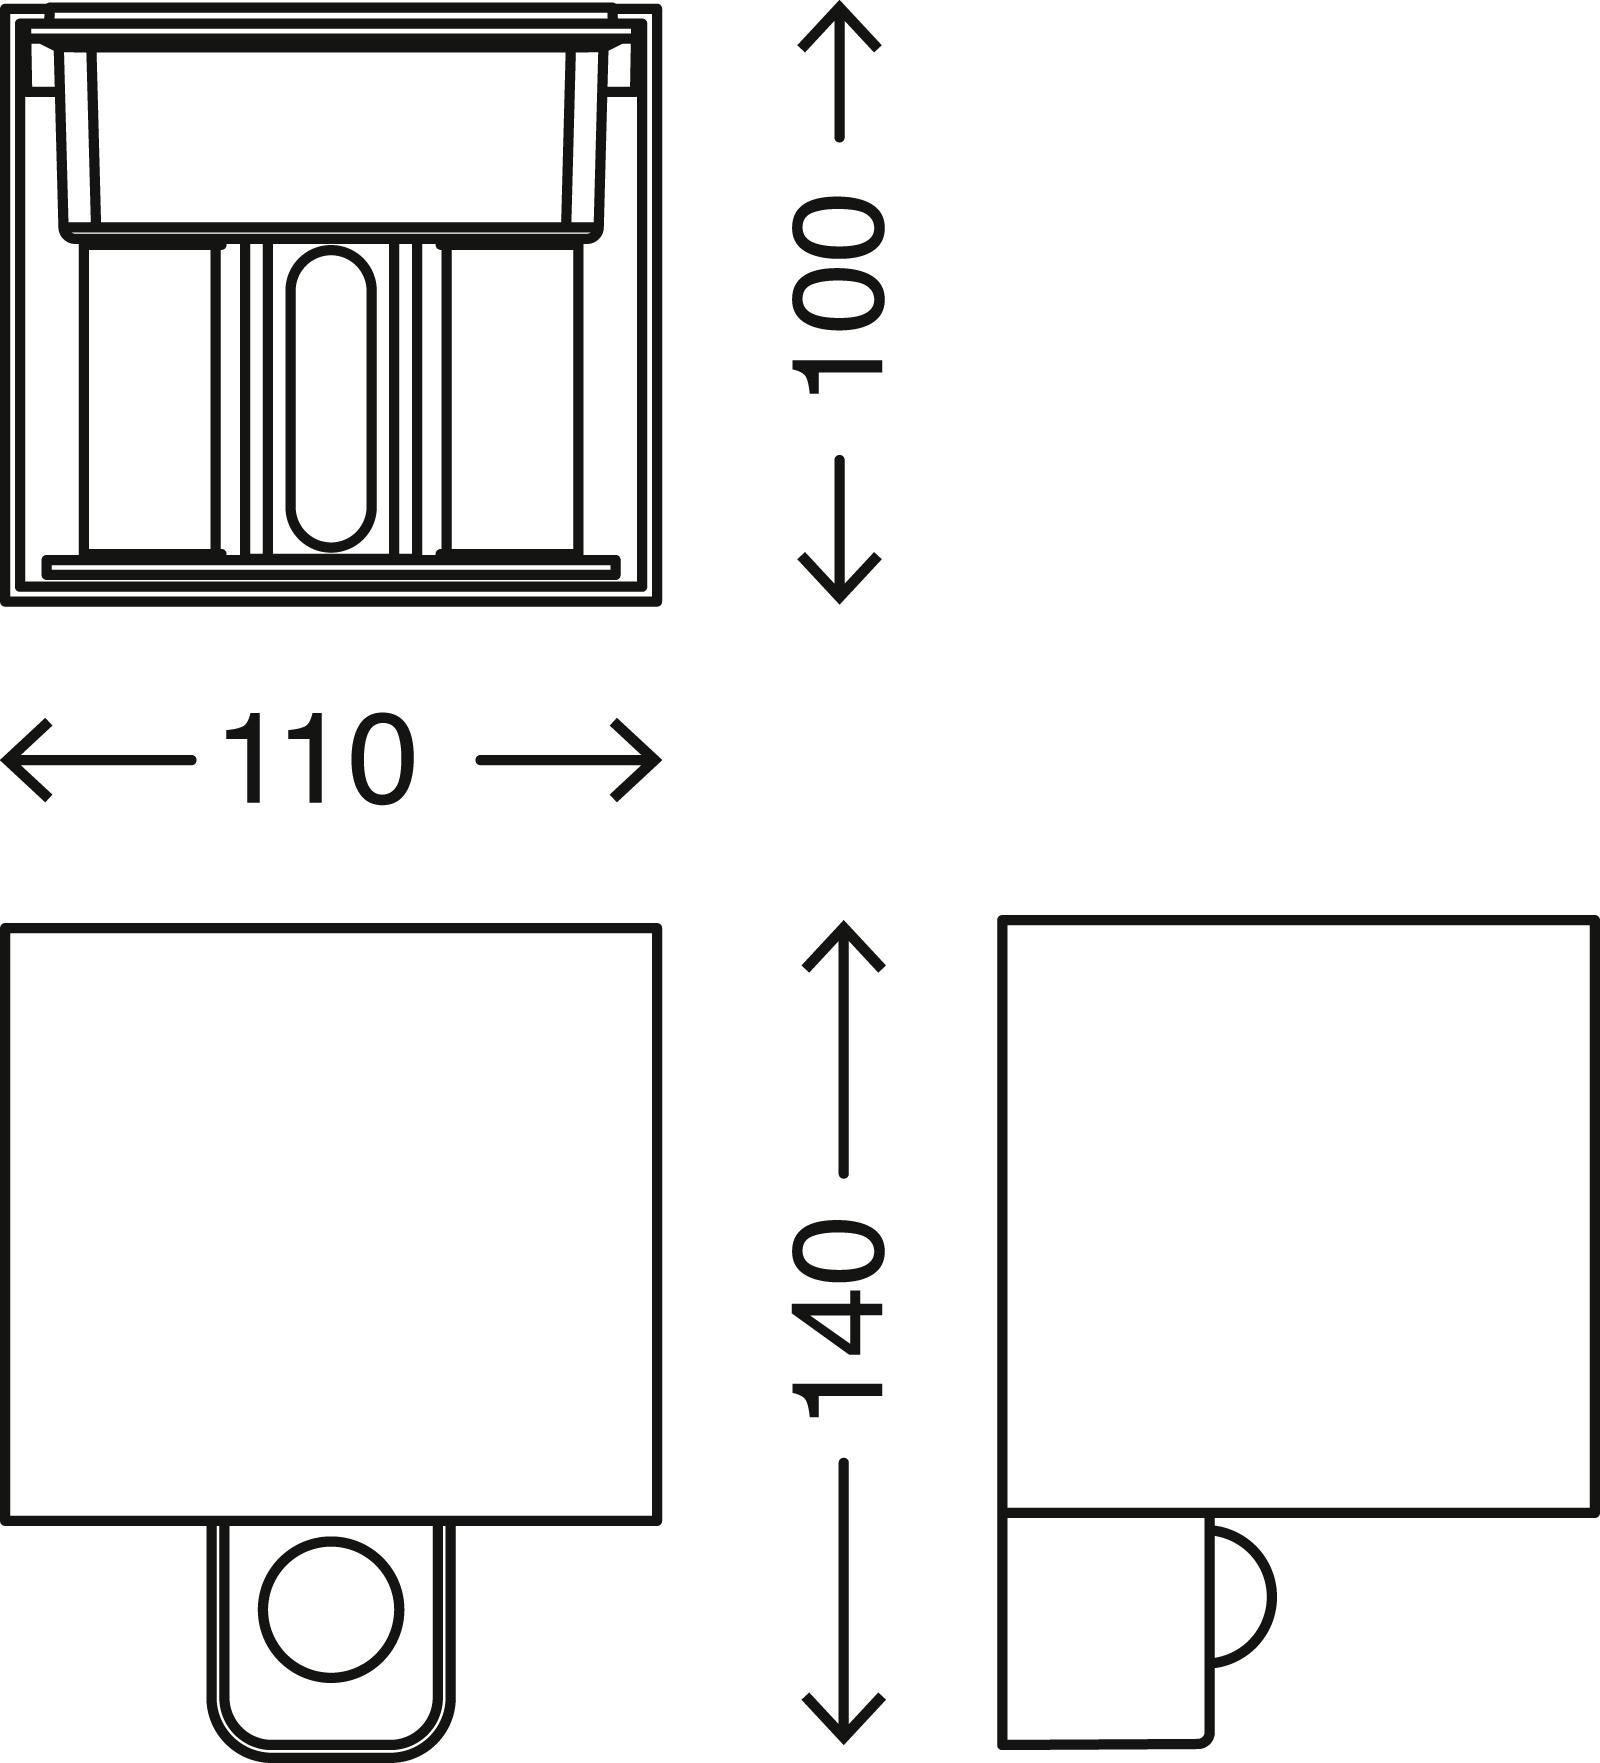 TELEFUNKEN LED Aussenwandleuchte, 11 cm, 7 W, Anthrazit